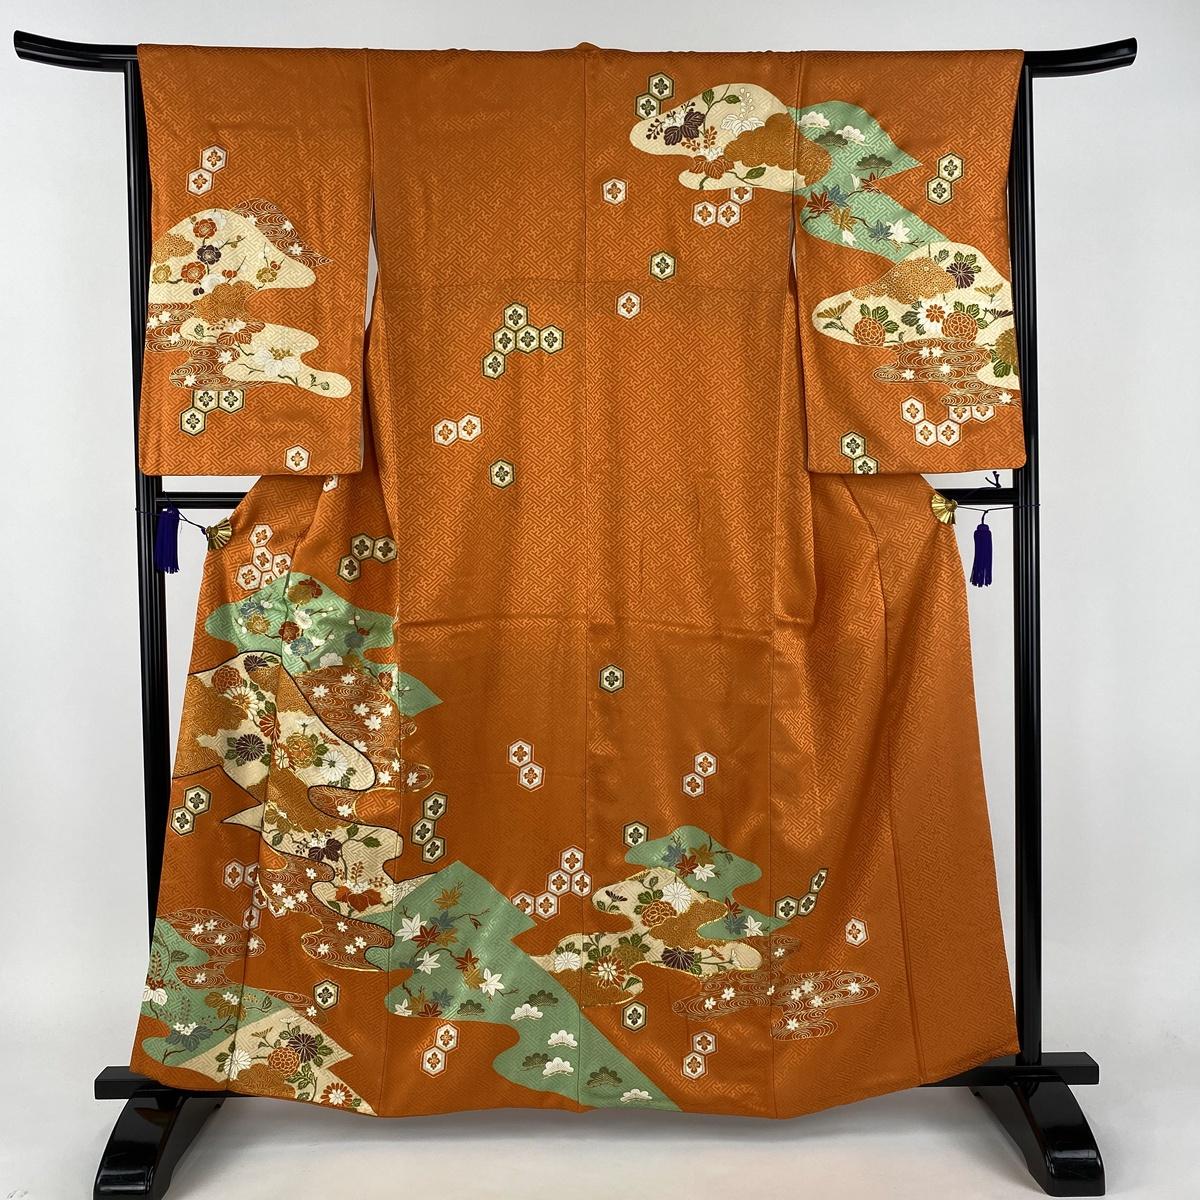 訪問着 秀品 菊 流水 金糸 金彩 オレンジ 袷 身丈160.5cm 裄丈65.5cm M 正絹 【中古】